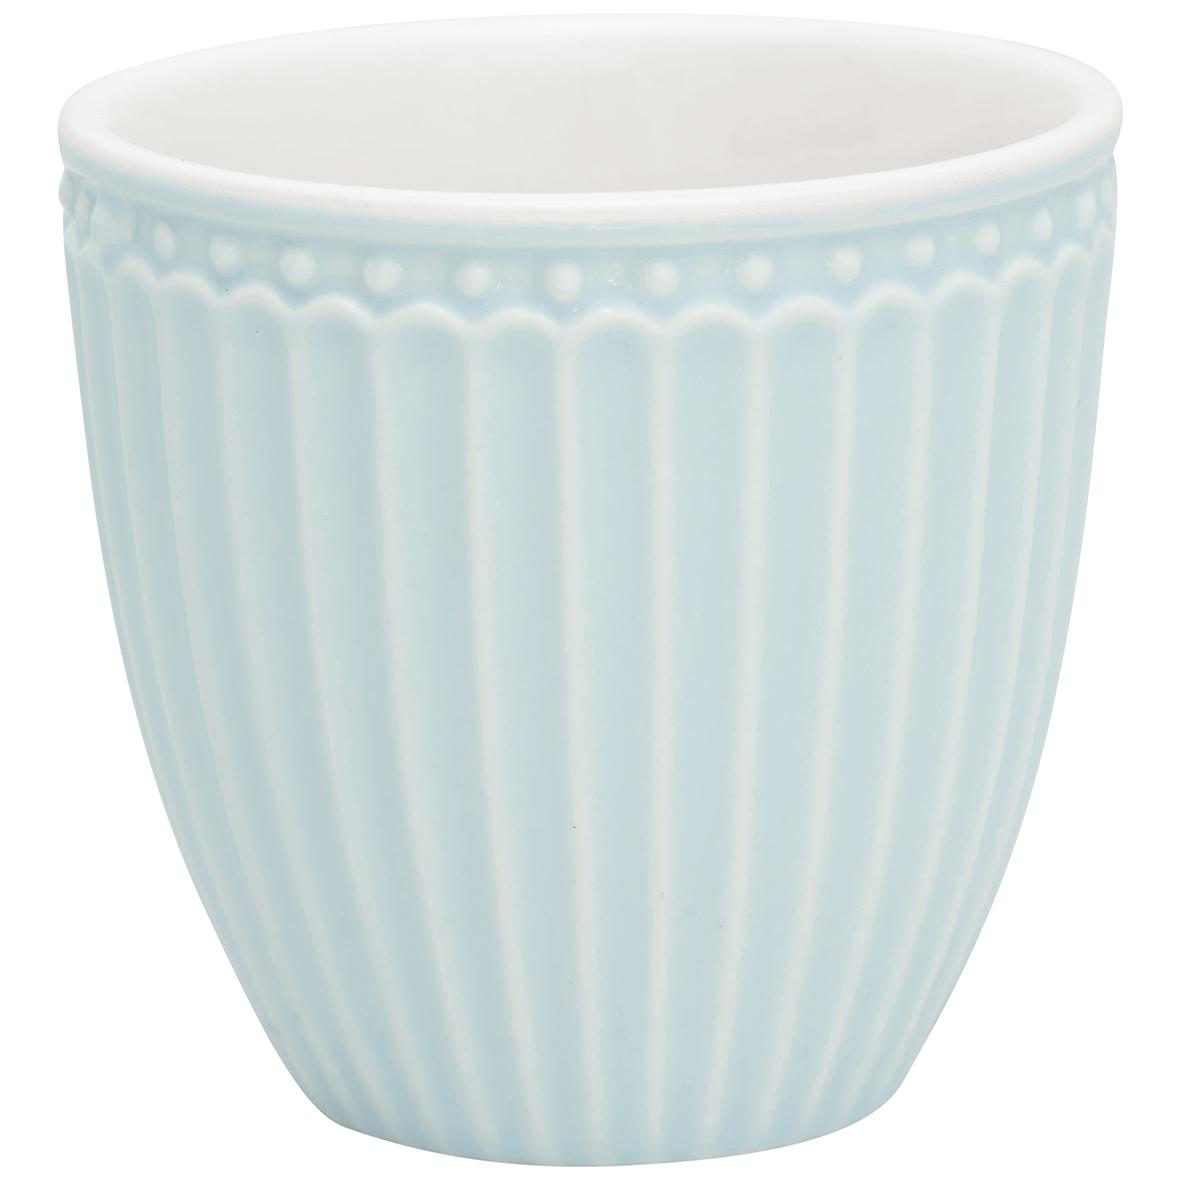 Espressotasse | Mini-Latte Cup - Alice pale blue - Greengate